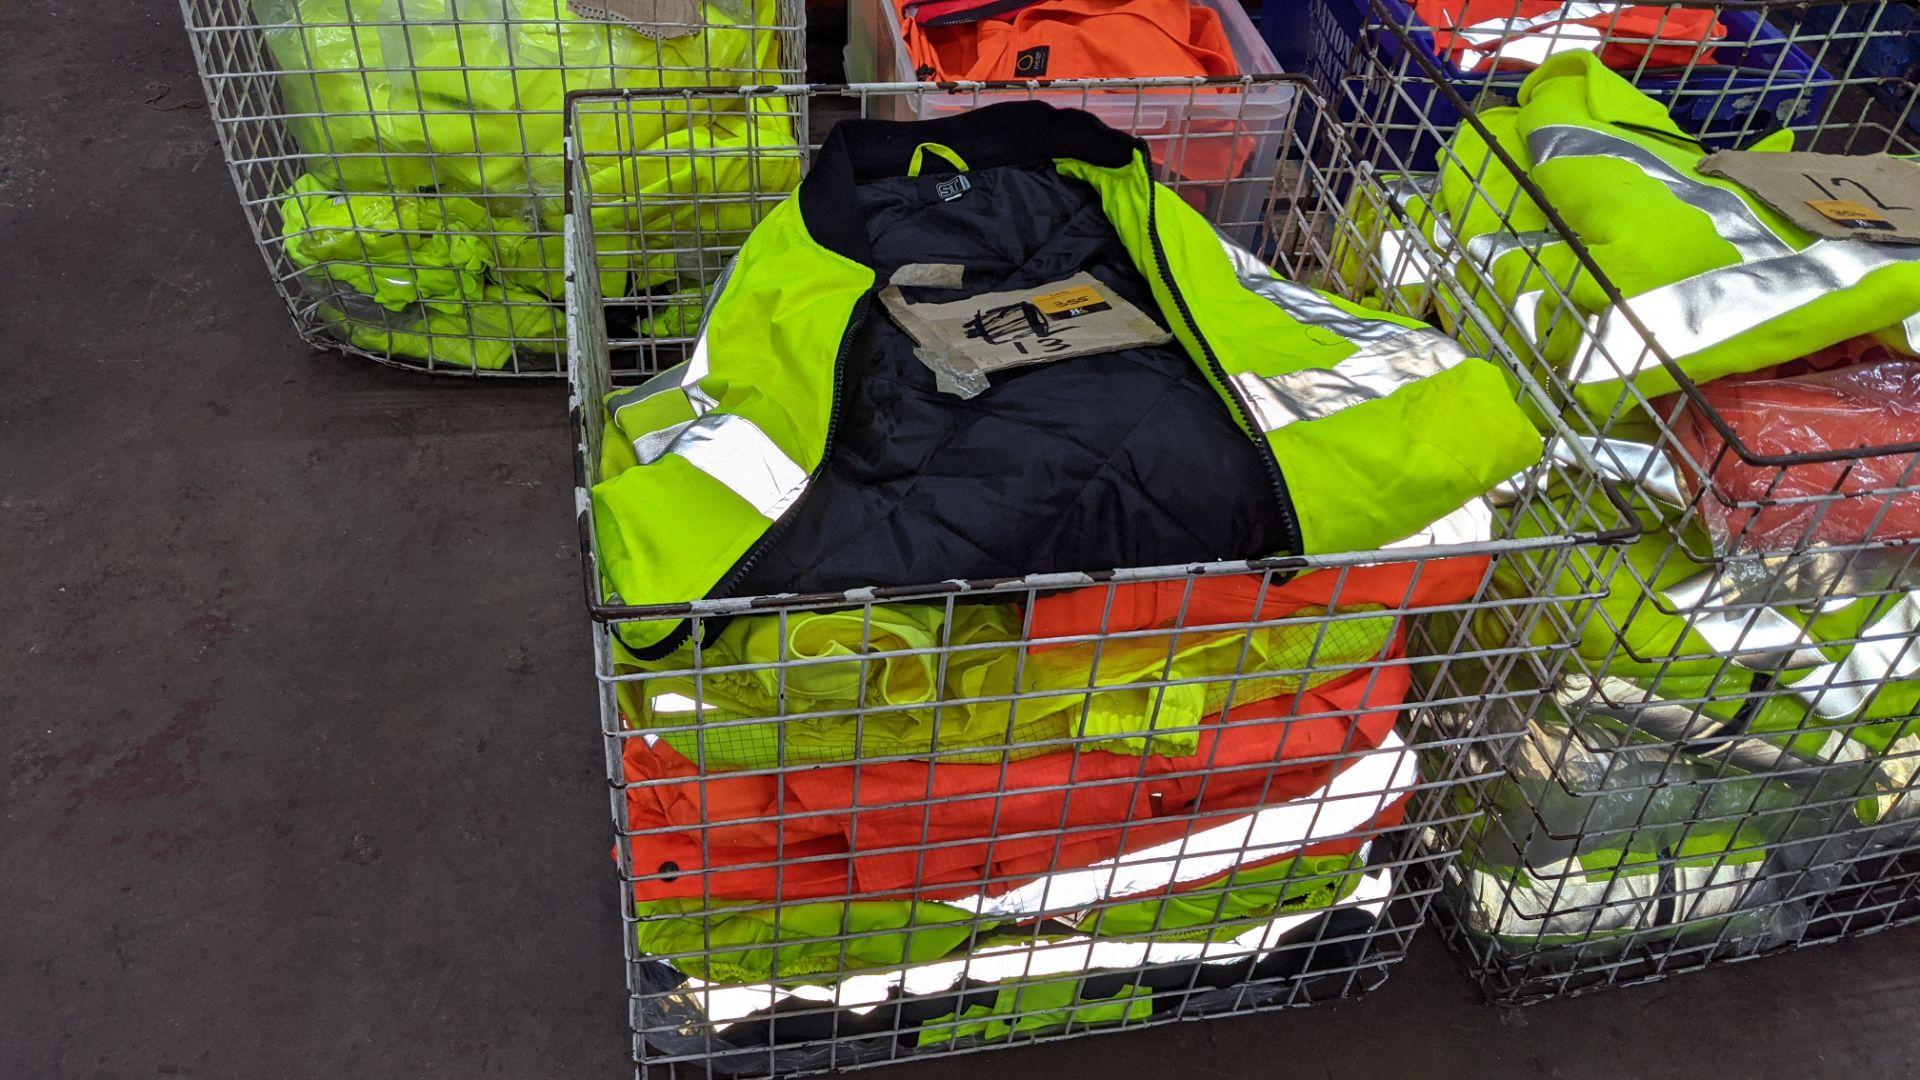 13 off assorted hi-vis jackets